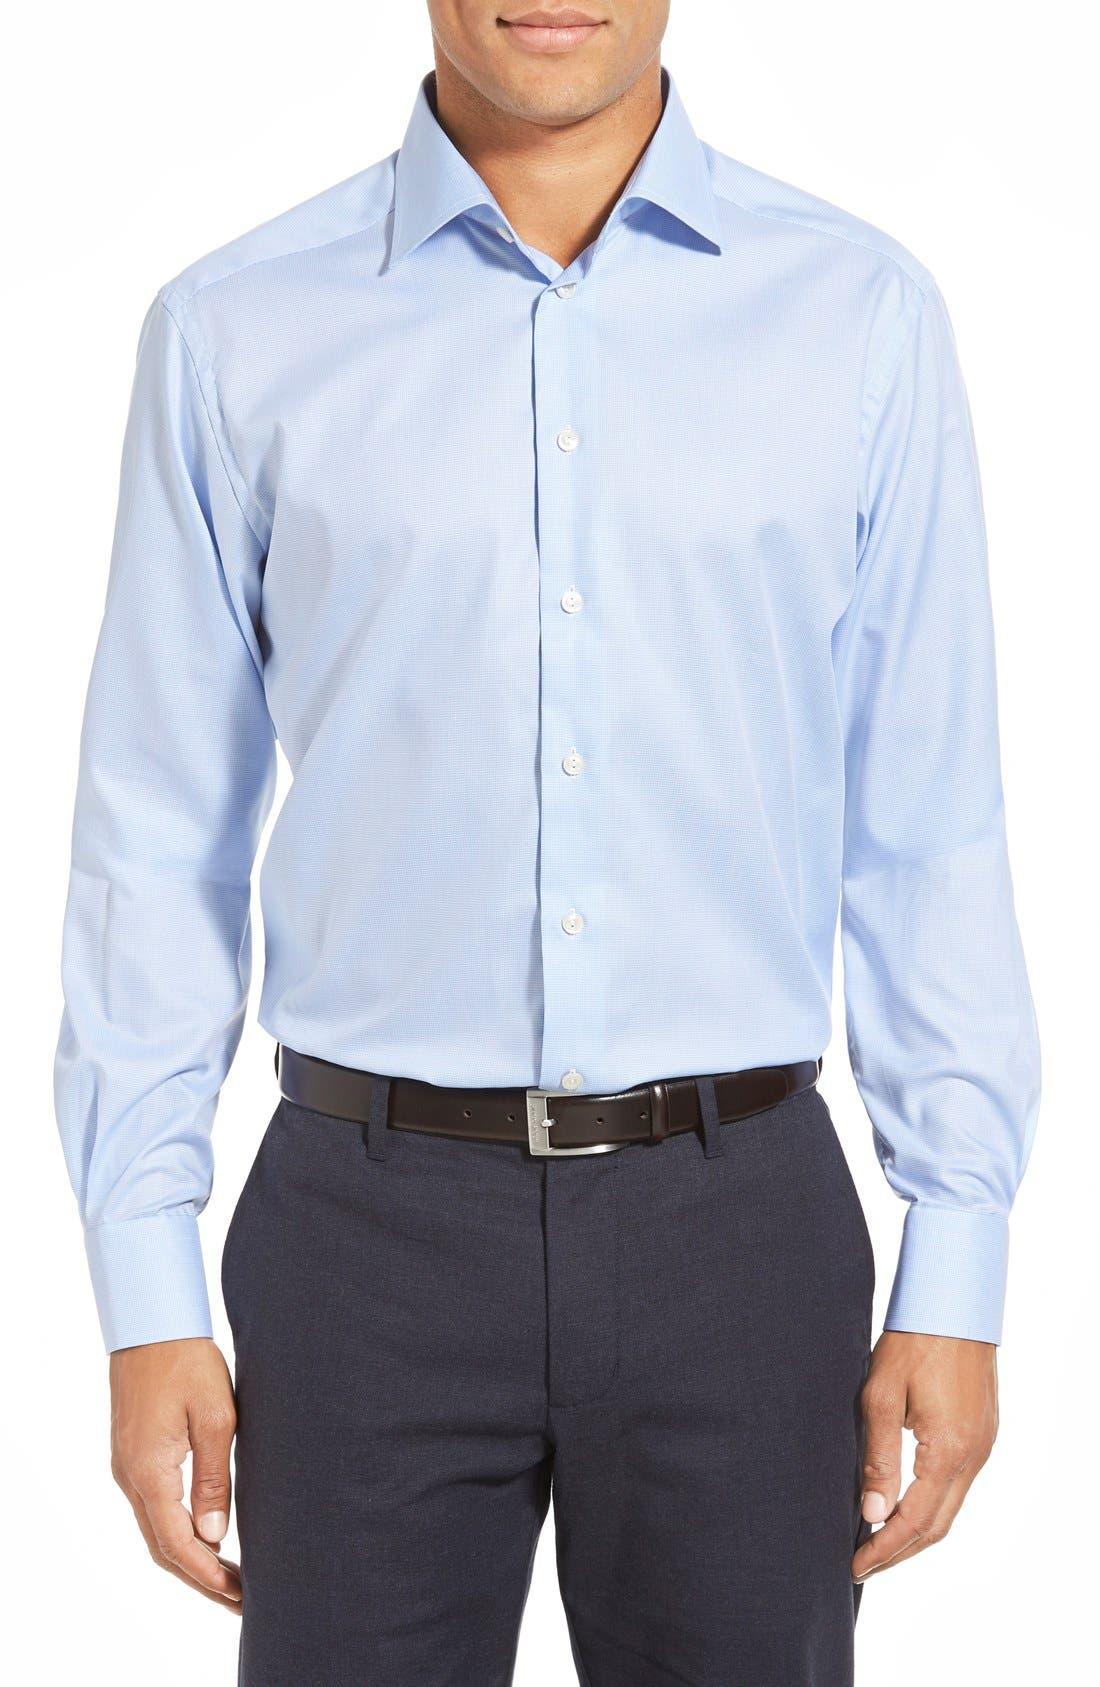 Alternate Image 2  - Eton Contemporary Fit Houndstooth Dress Shirt